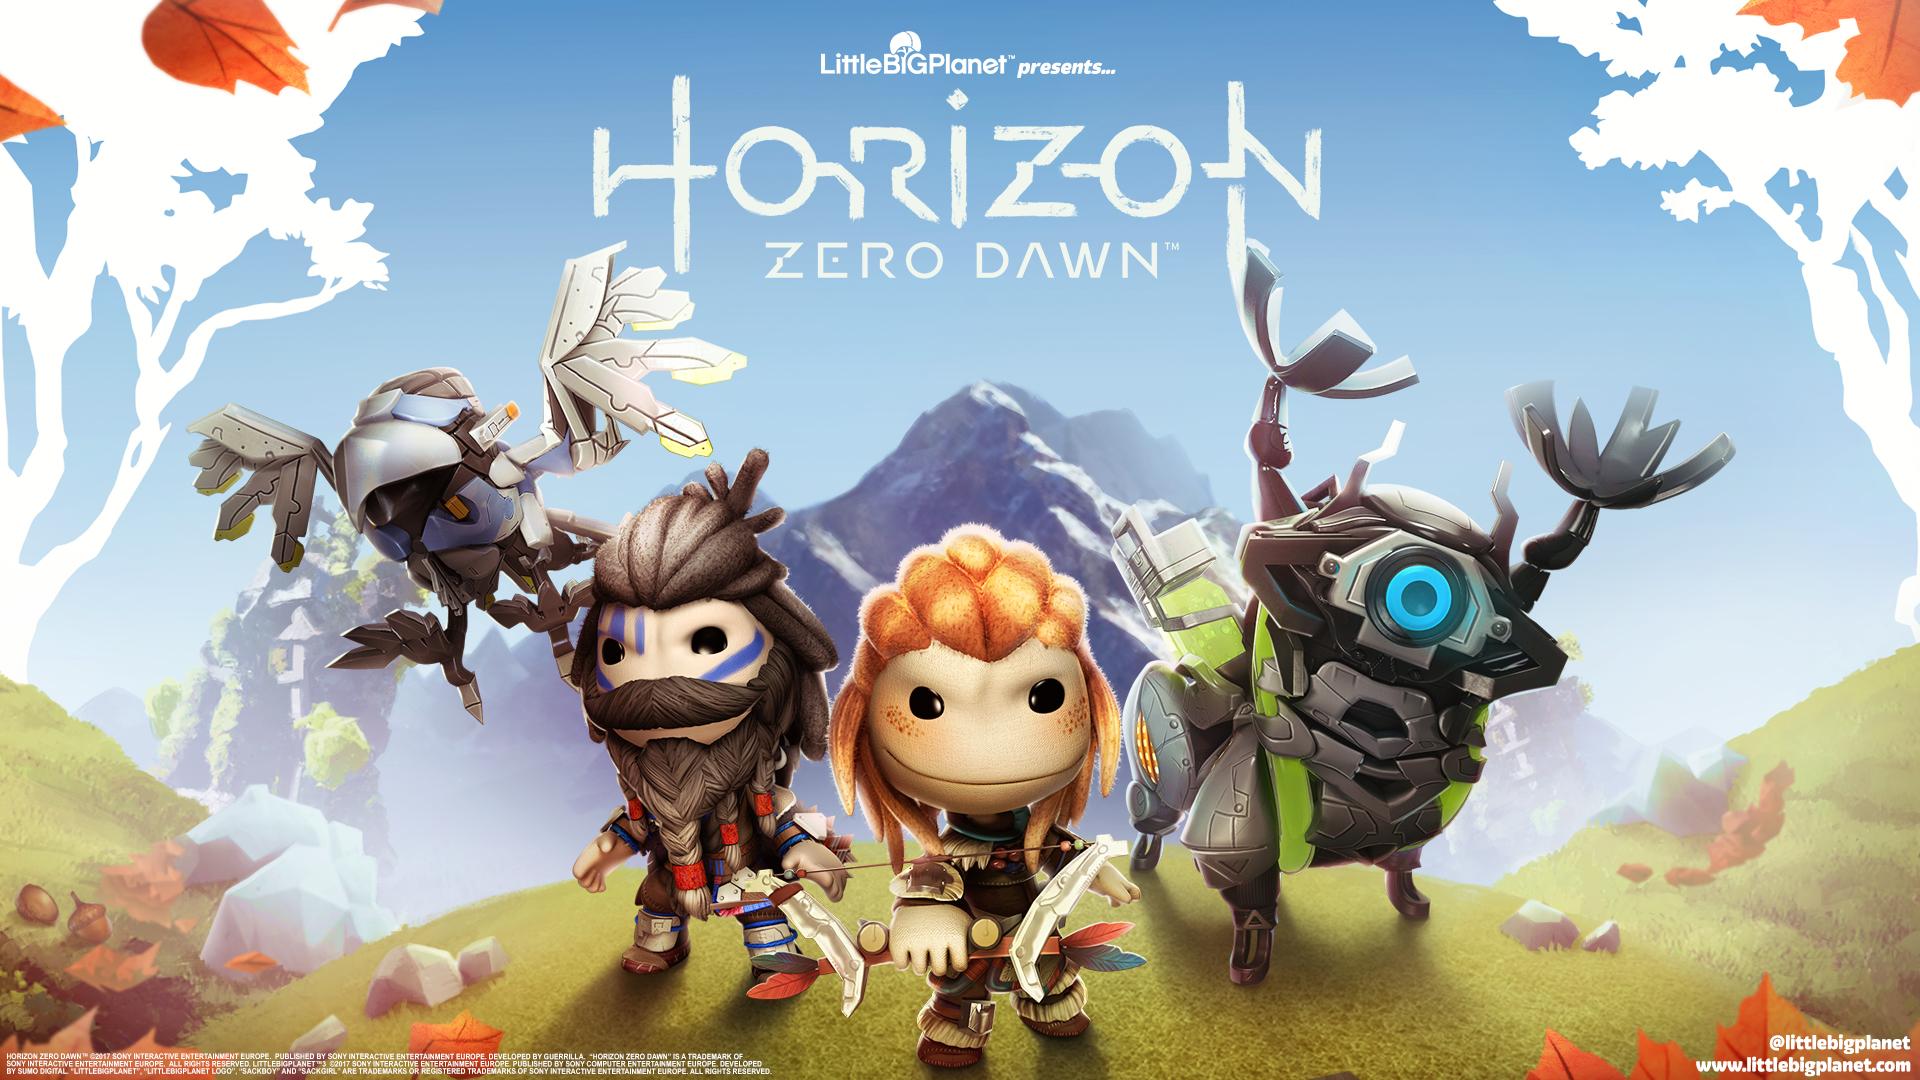 1400x1050 Horizon Zero Dawn Little Big Planet 3 1400x1050